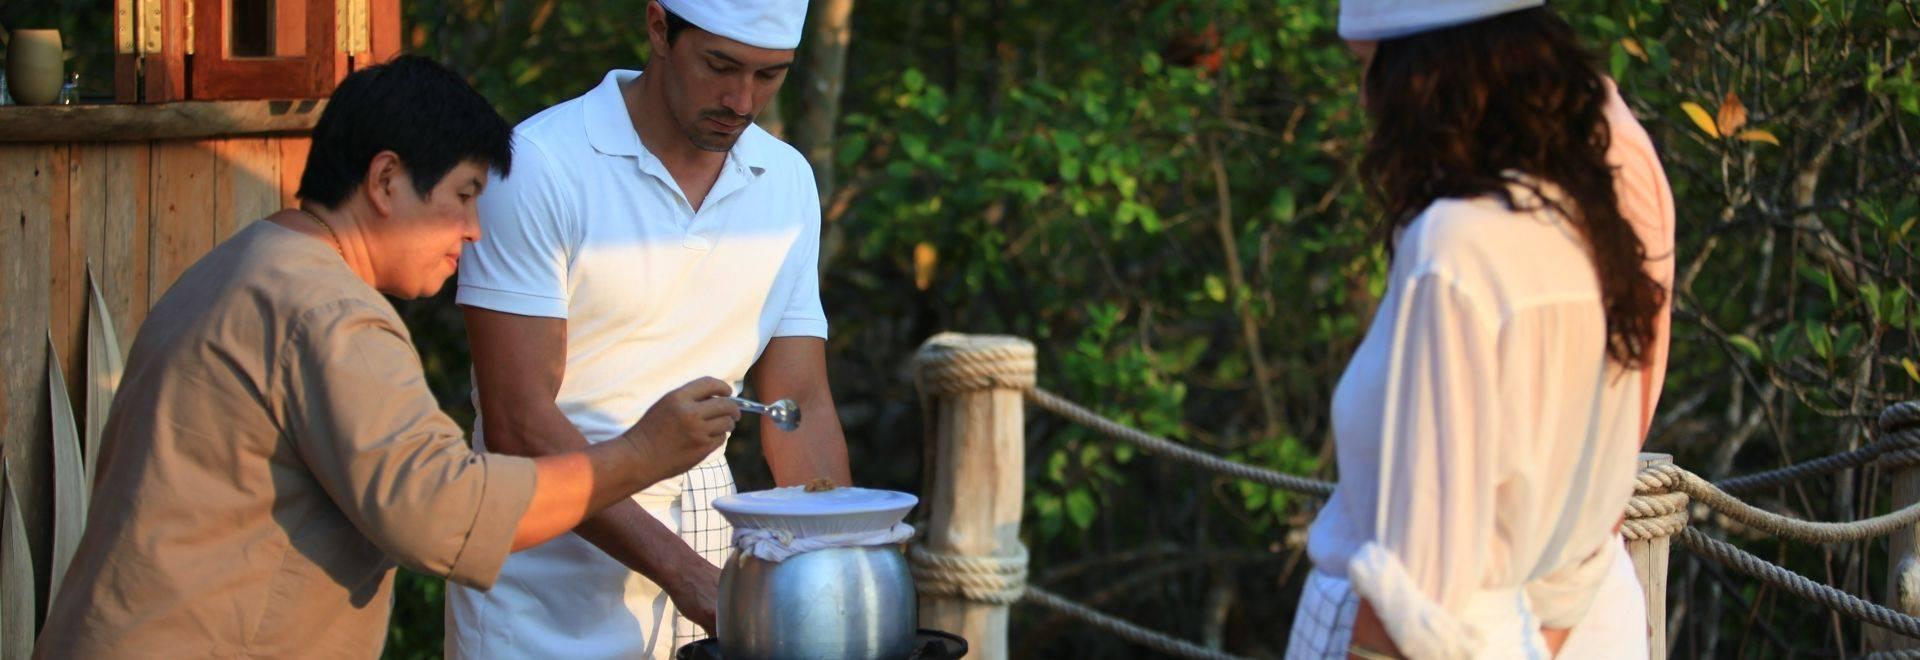 Soneva-kiri-cooking-class.JPG